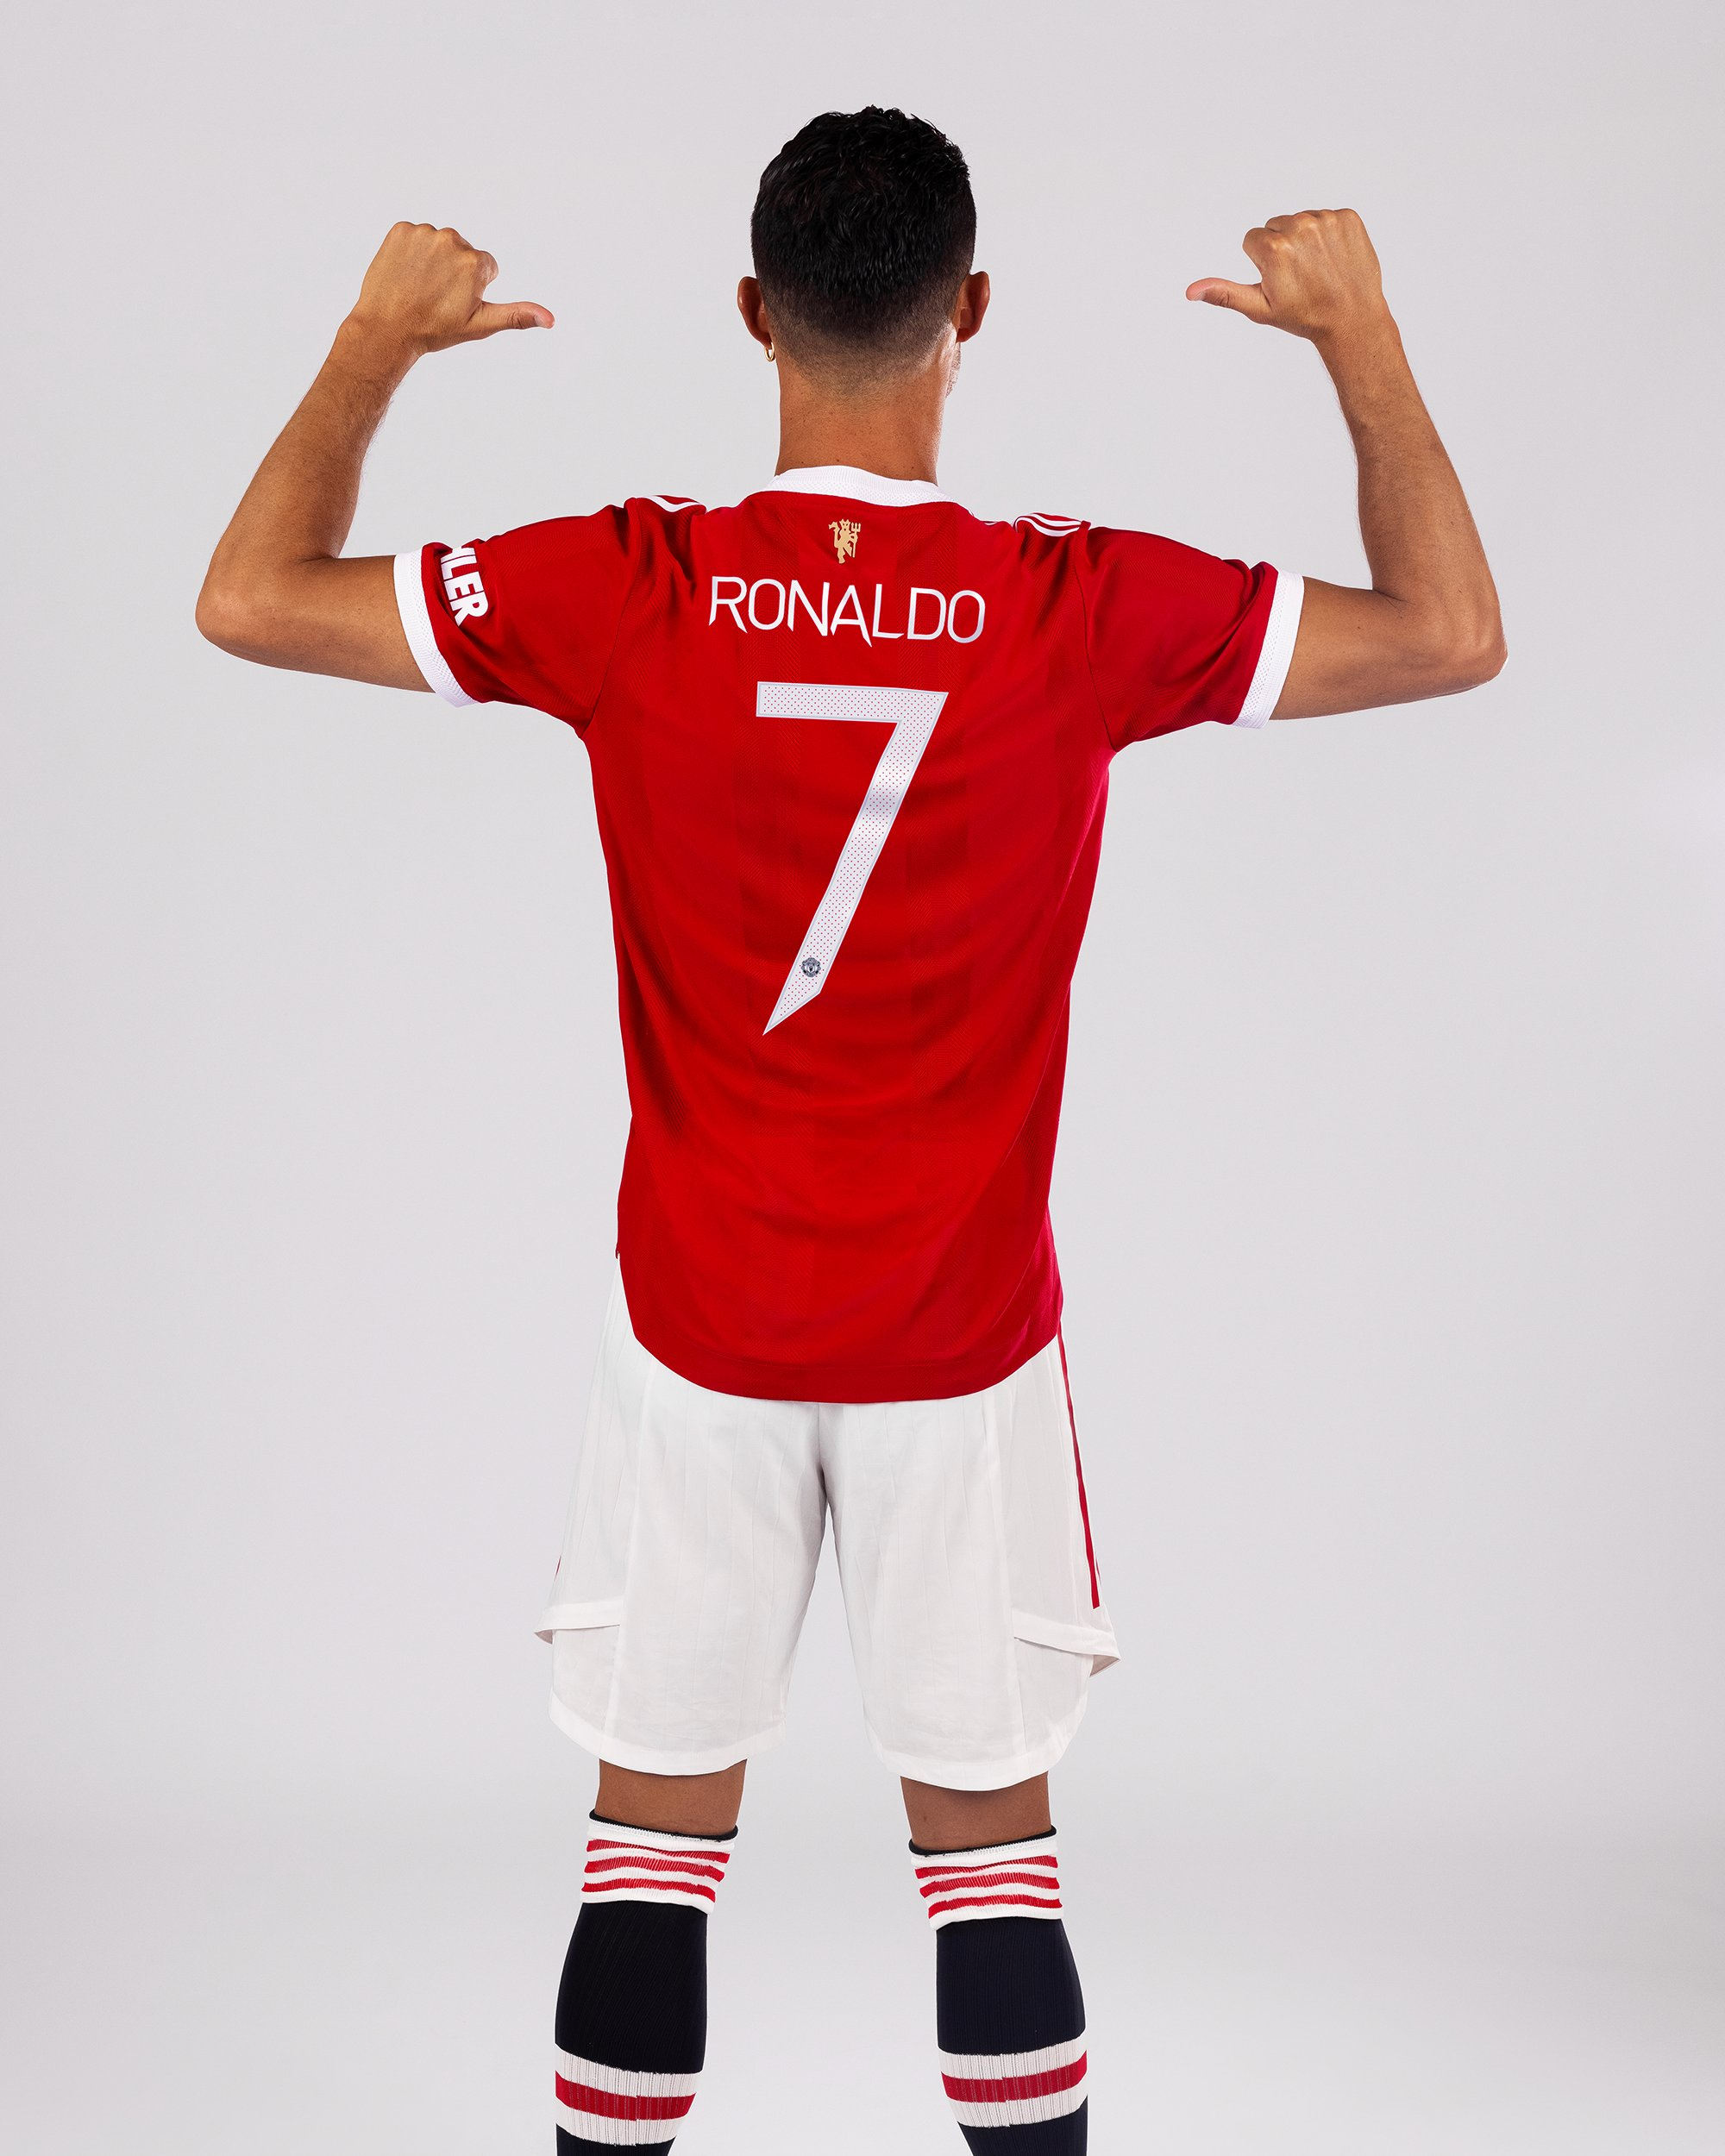 Manchester United'da 7 numaralı forma Cristiano Ronaldo'nun oldu.